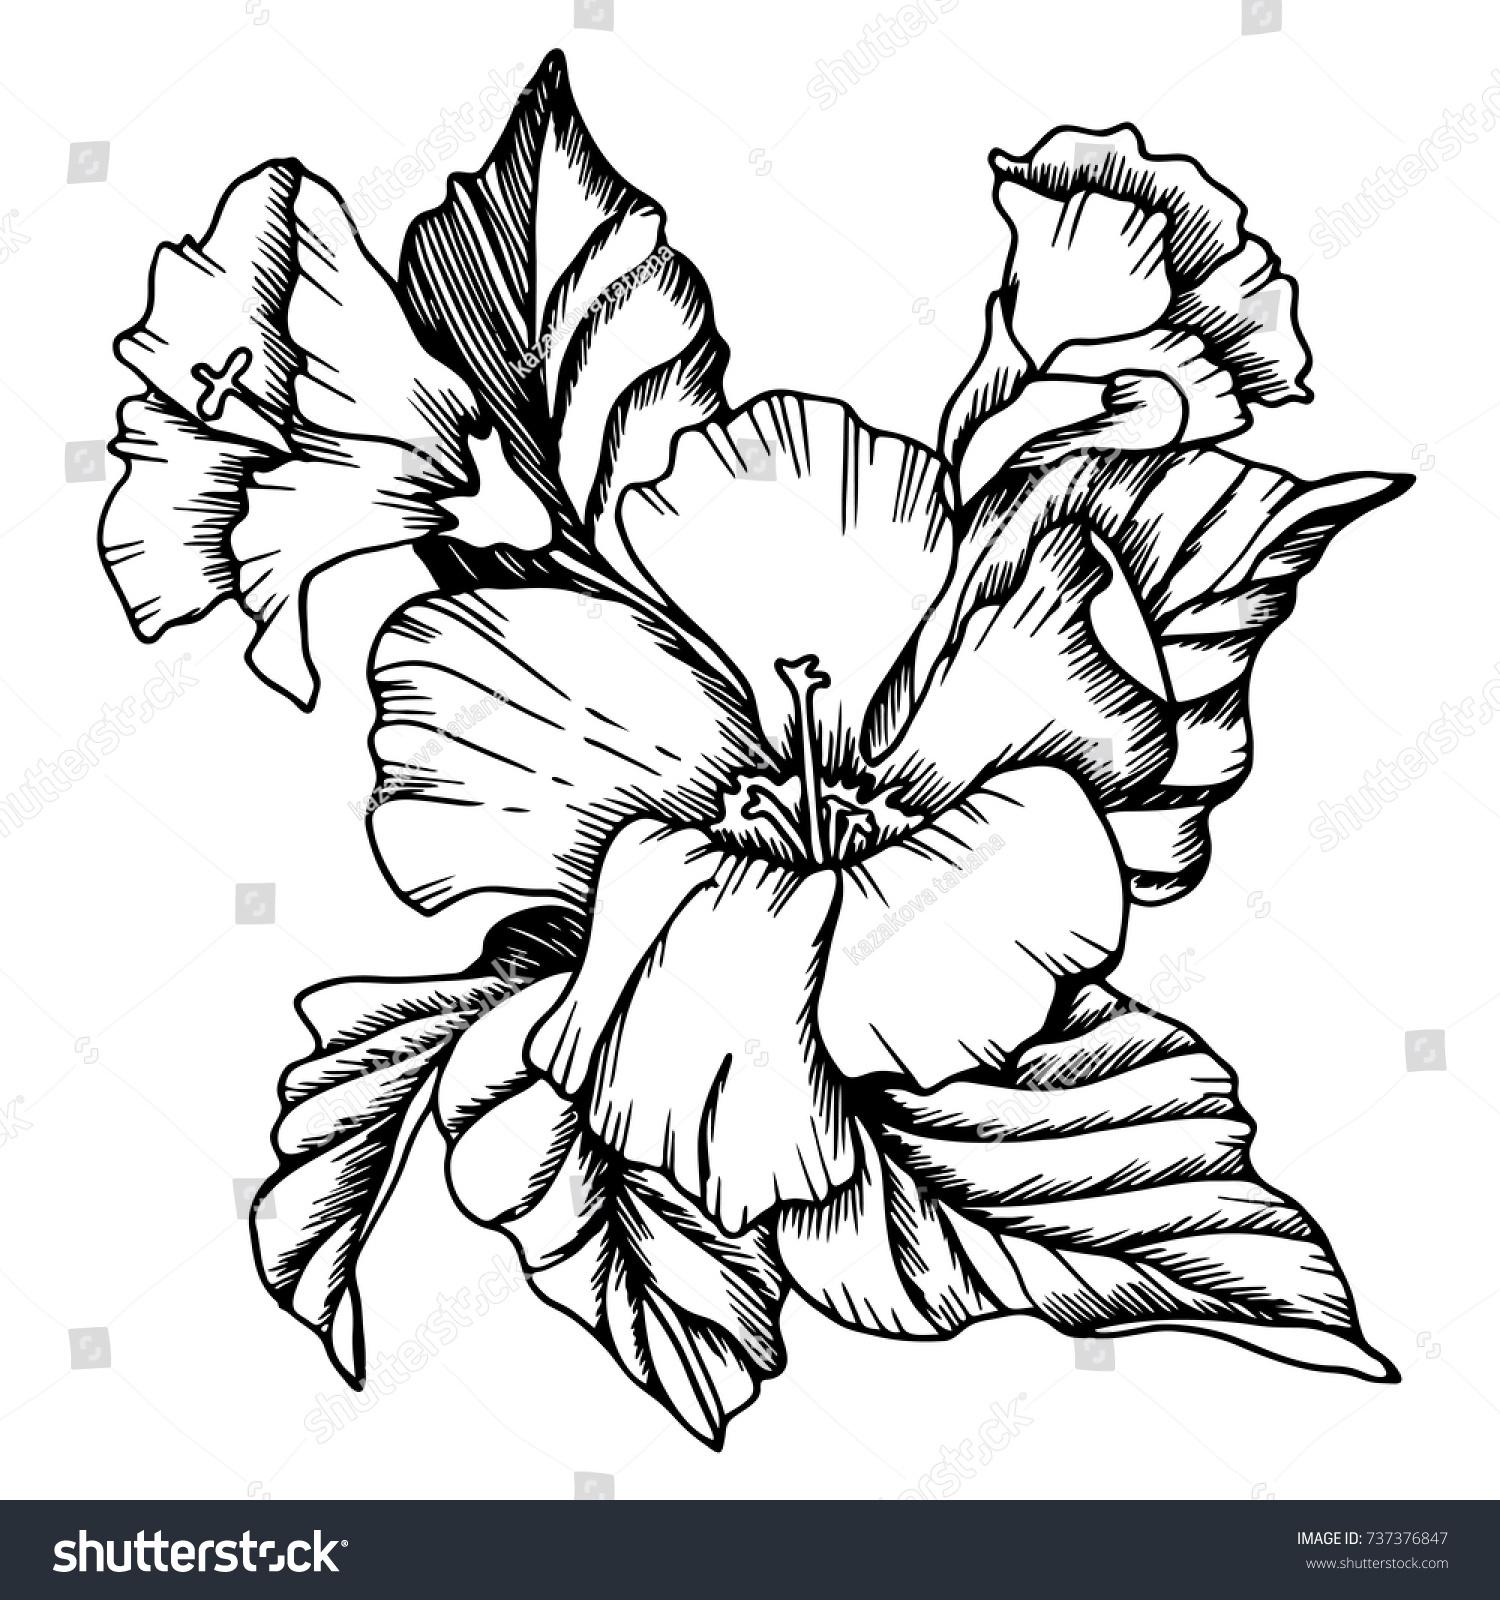 Vector hibiscus flowers blackandwhite solution drawn stock vector vector hibiscus flowers black and white solution drawn manuallye design izmirmasajfo